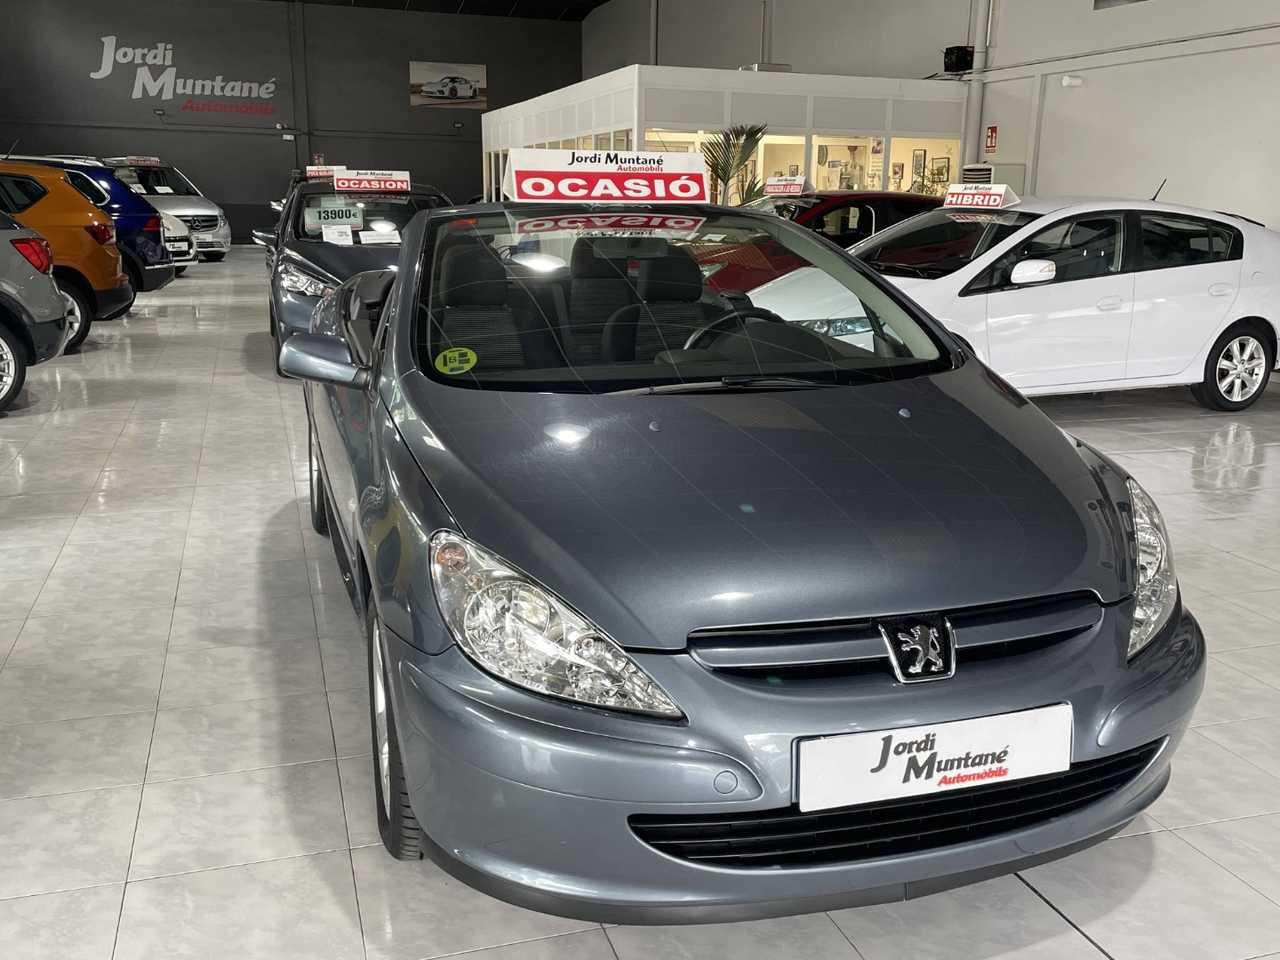 Peugeot 307 CC 1.6i 110cv